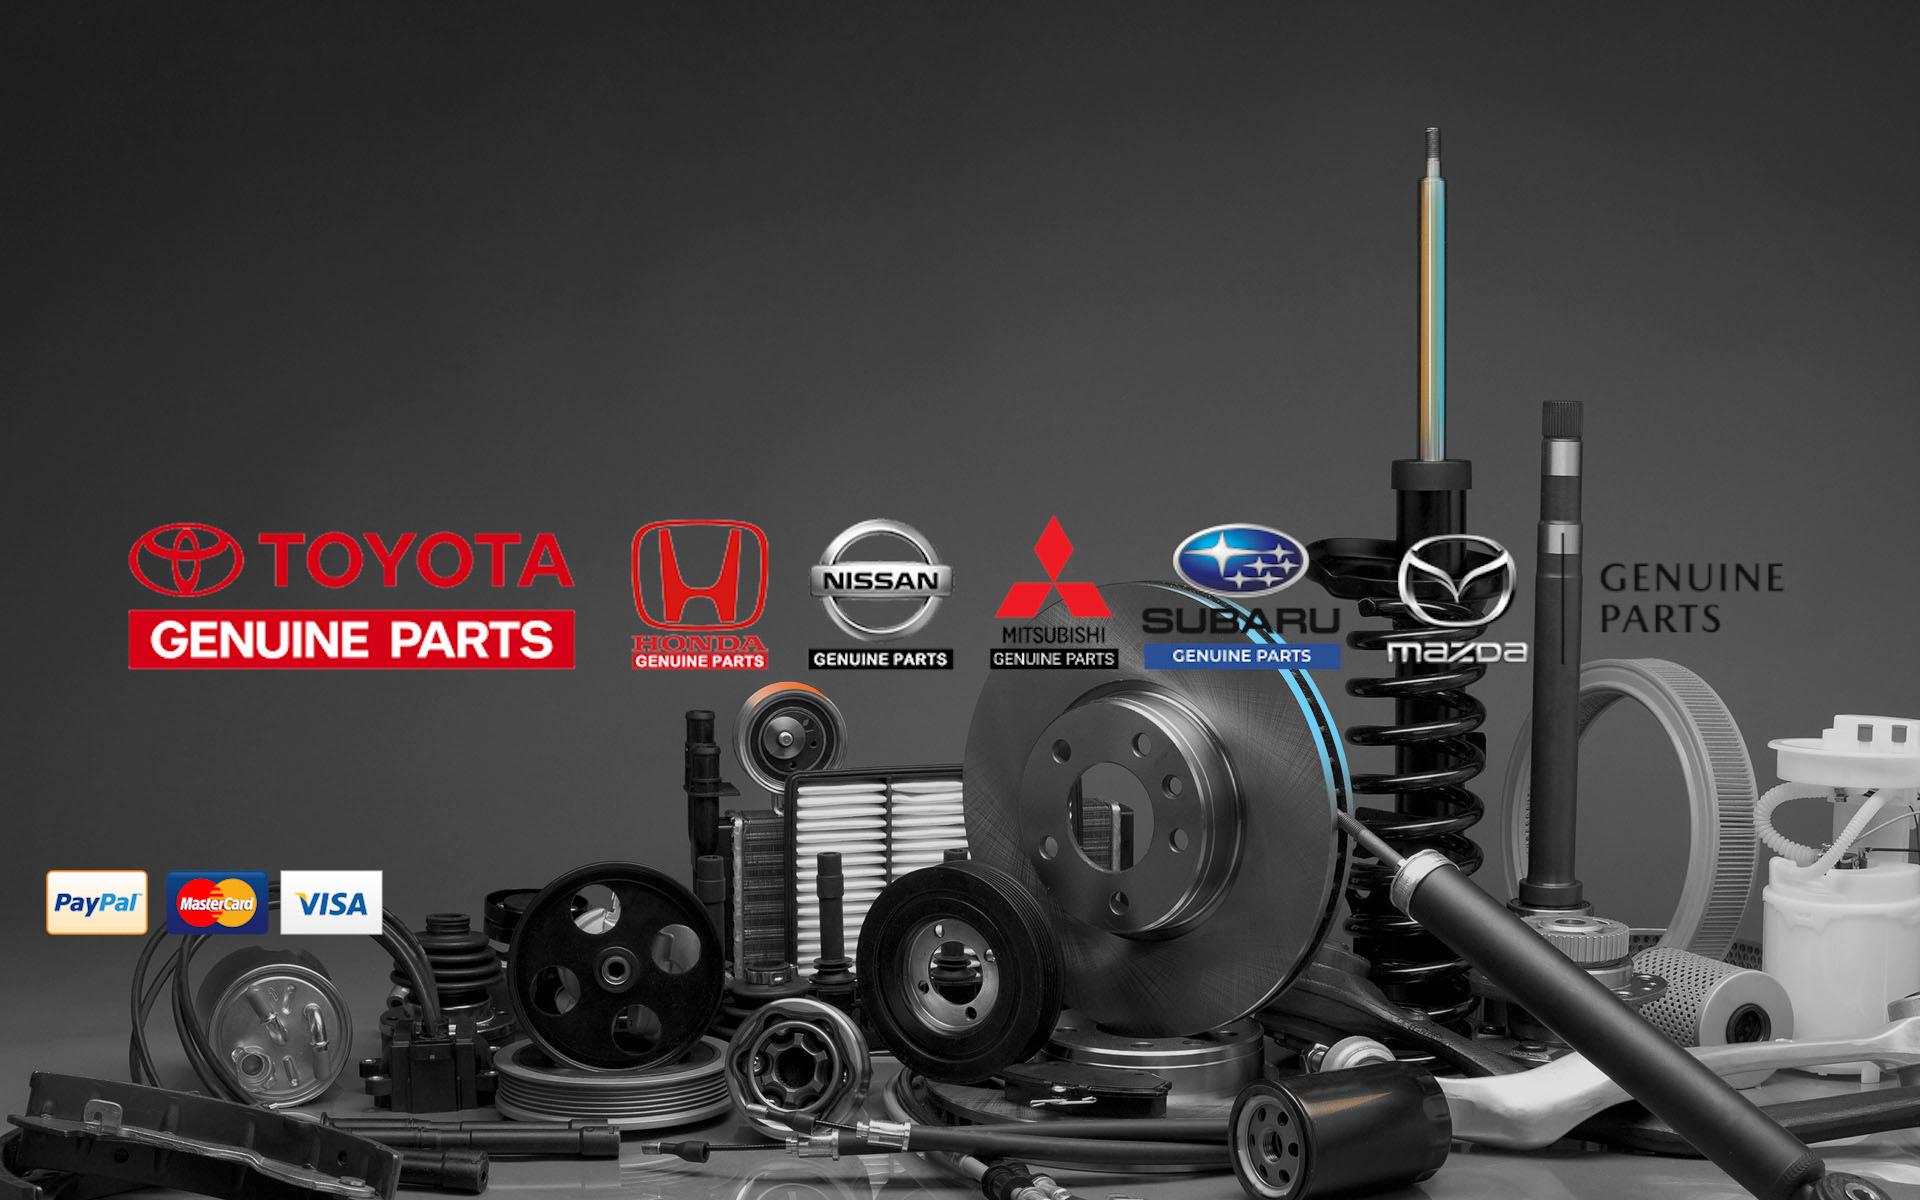 Best Genuine Spare Parts Provider Dubai Buy Genuine Spare Parts